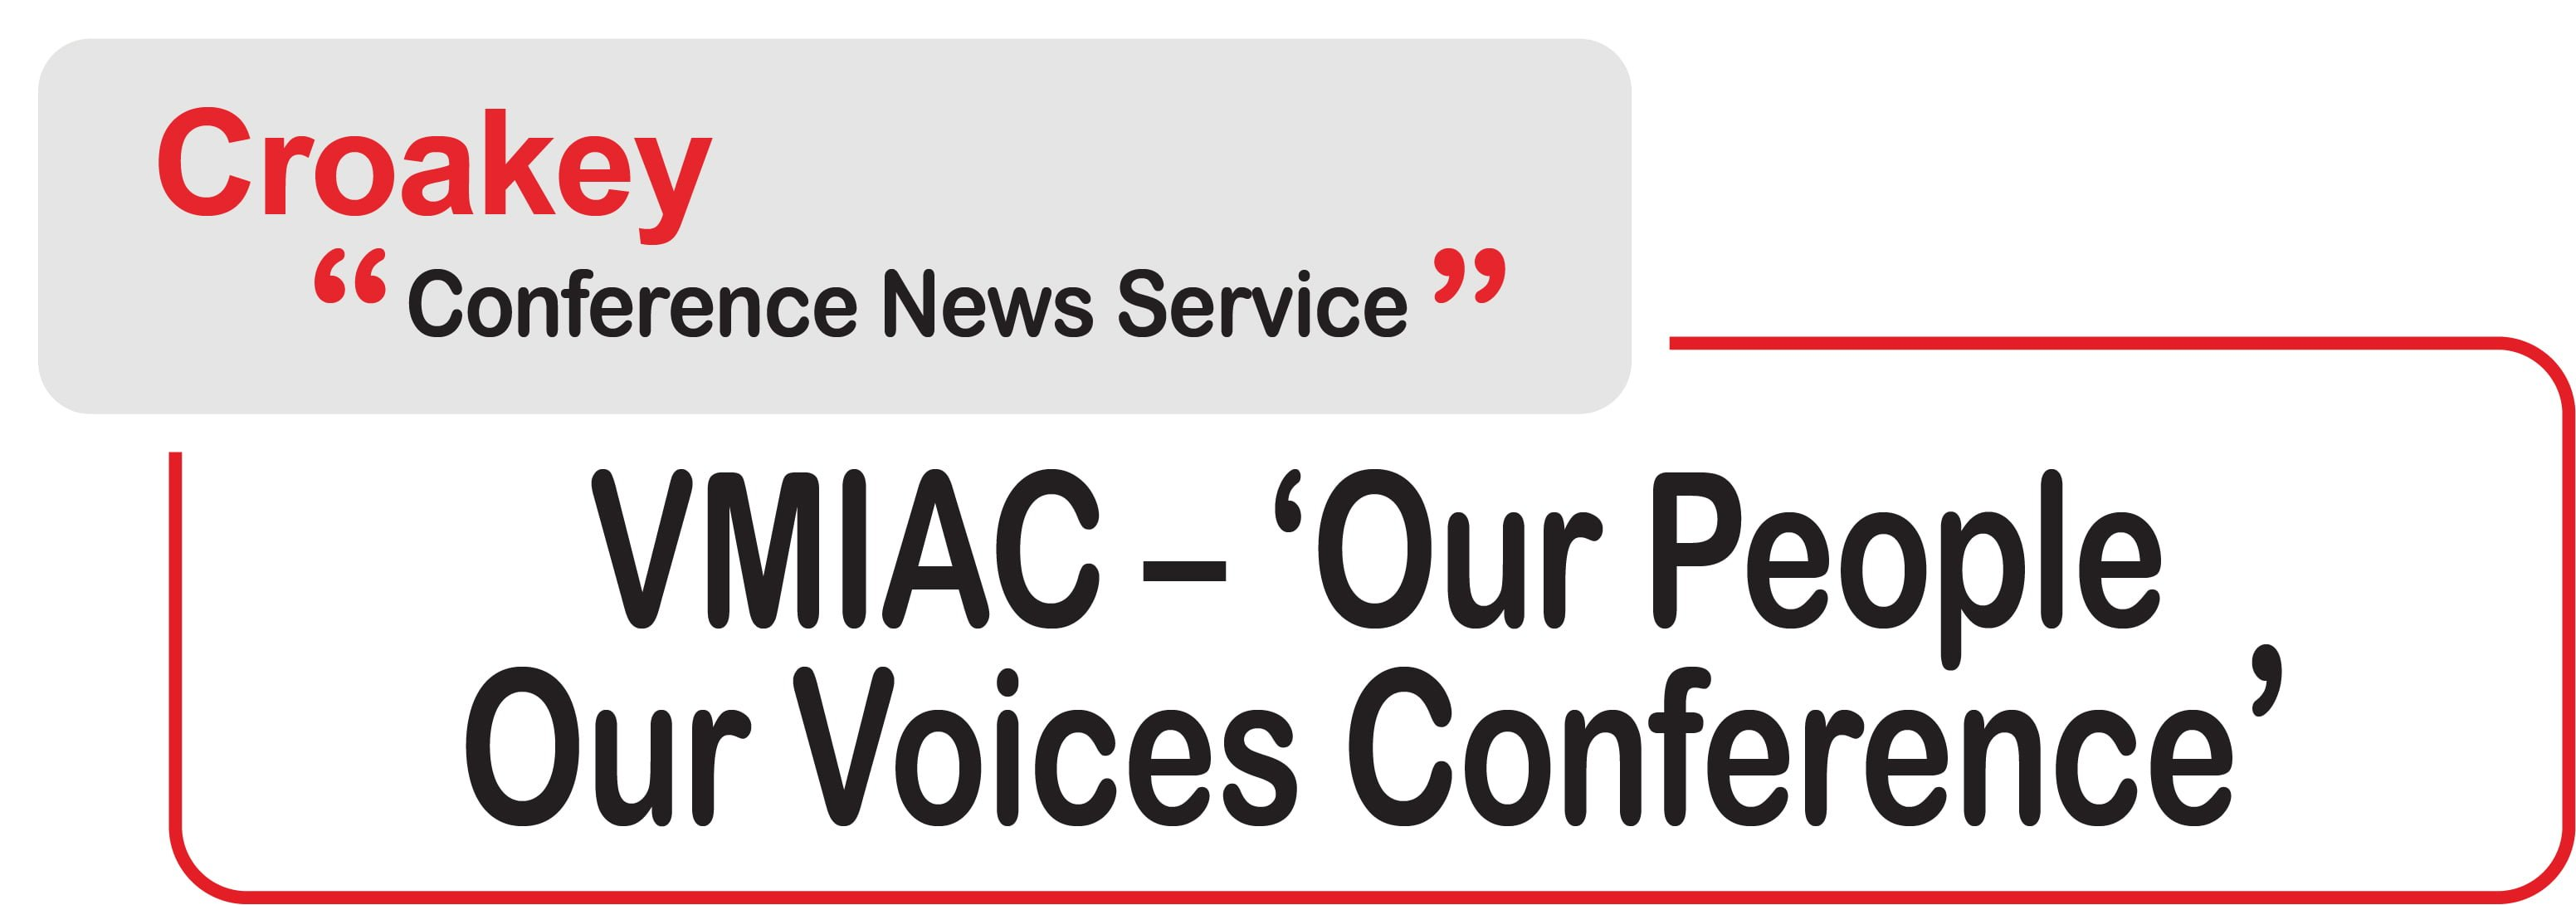 CCNS_VMIAC_Conf_logo